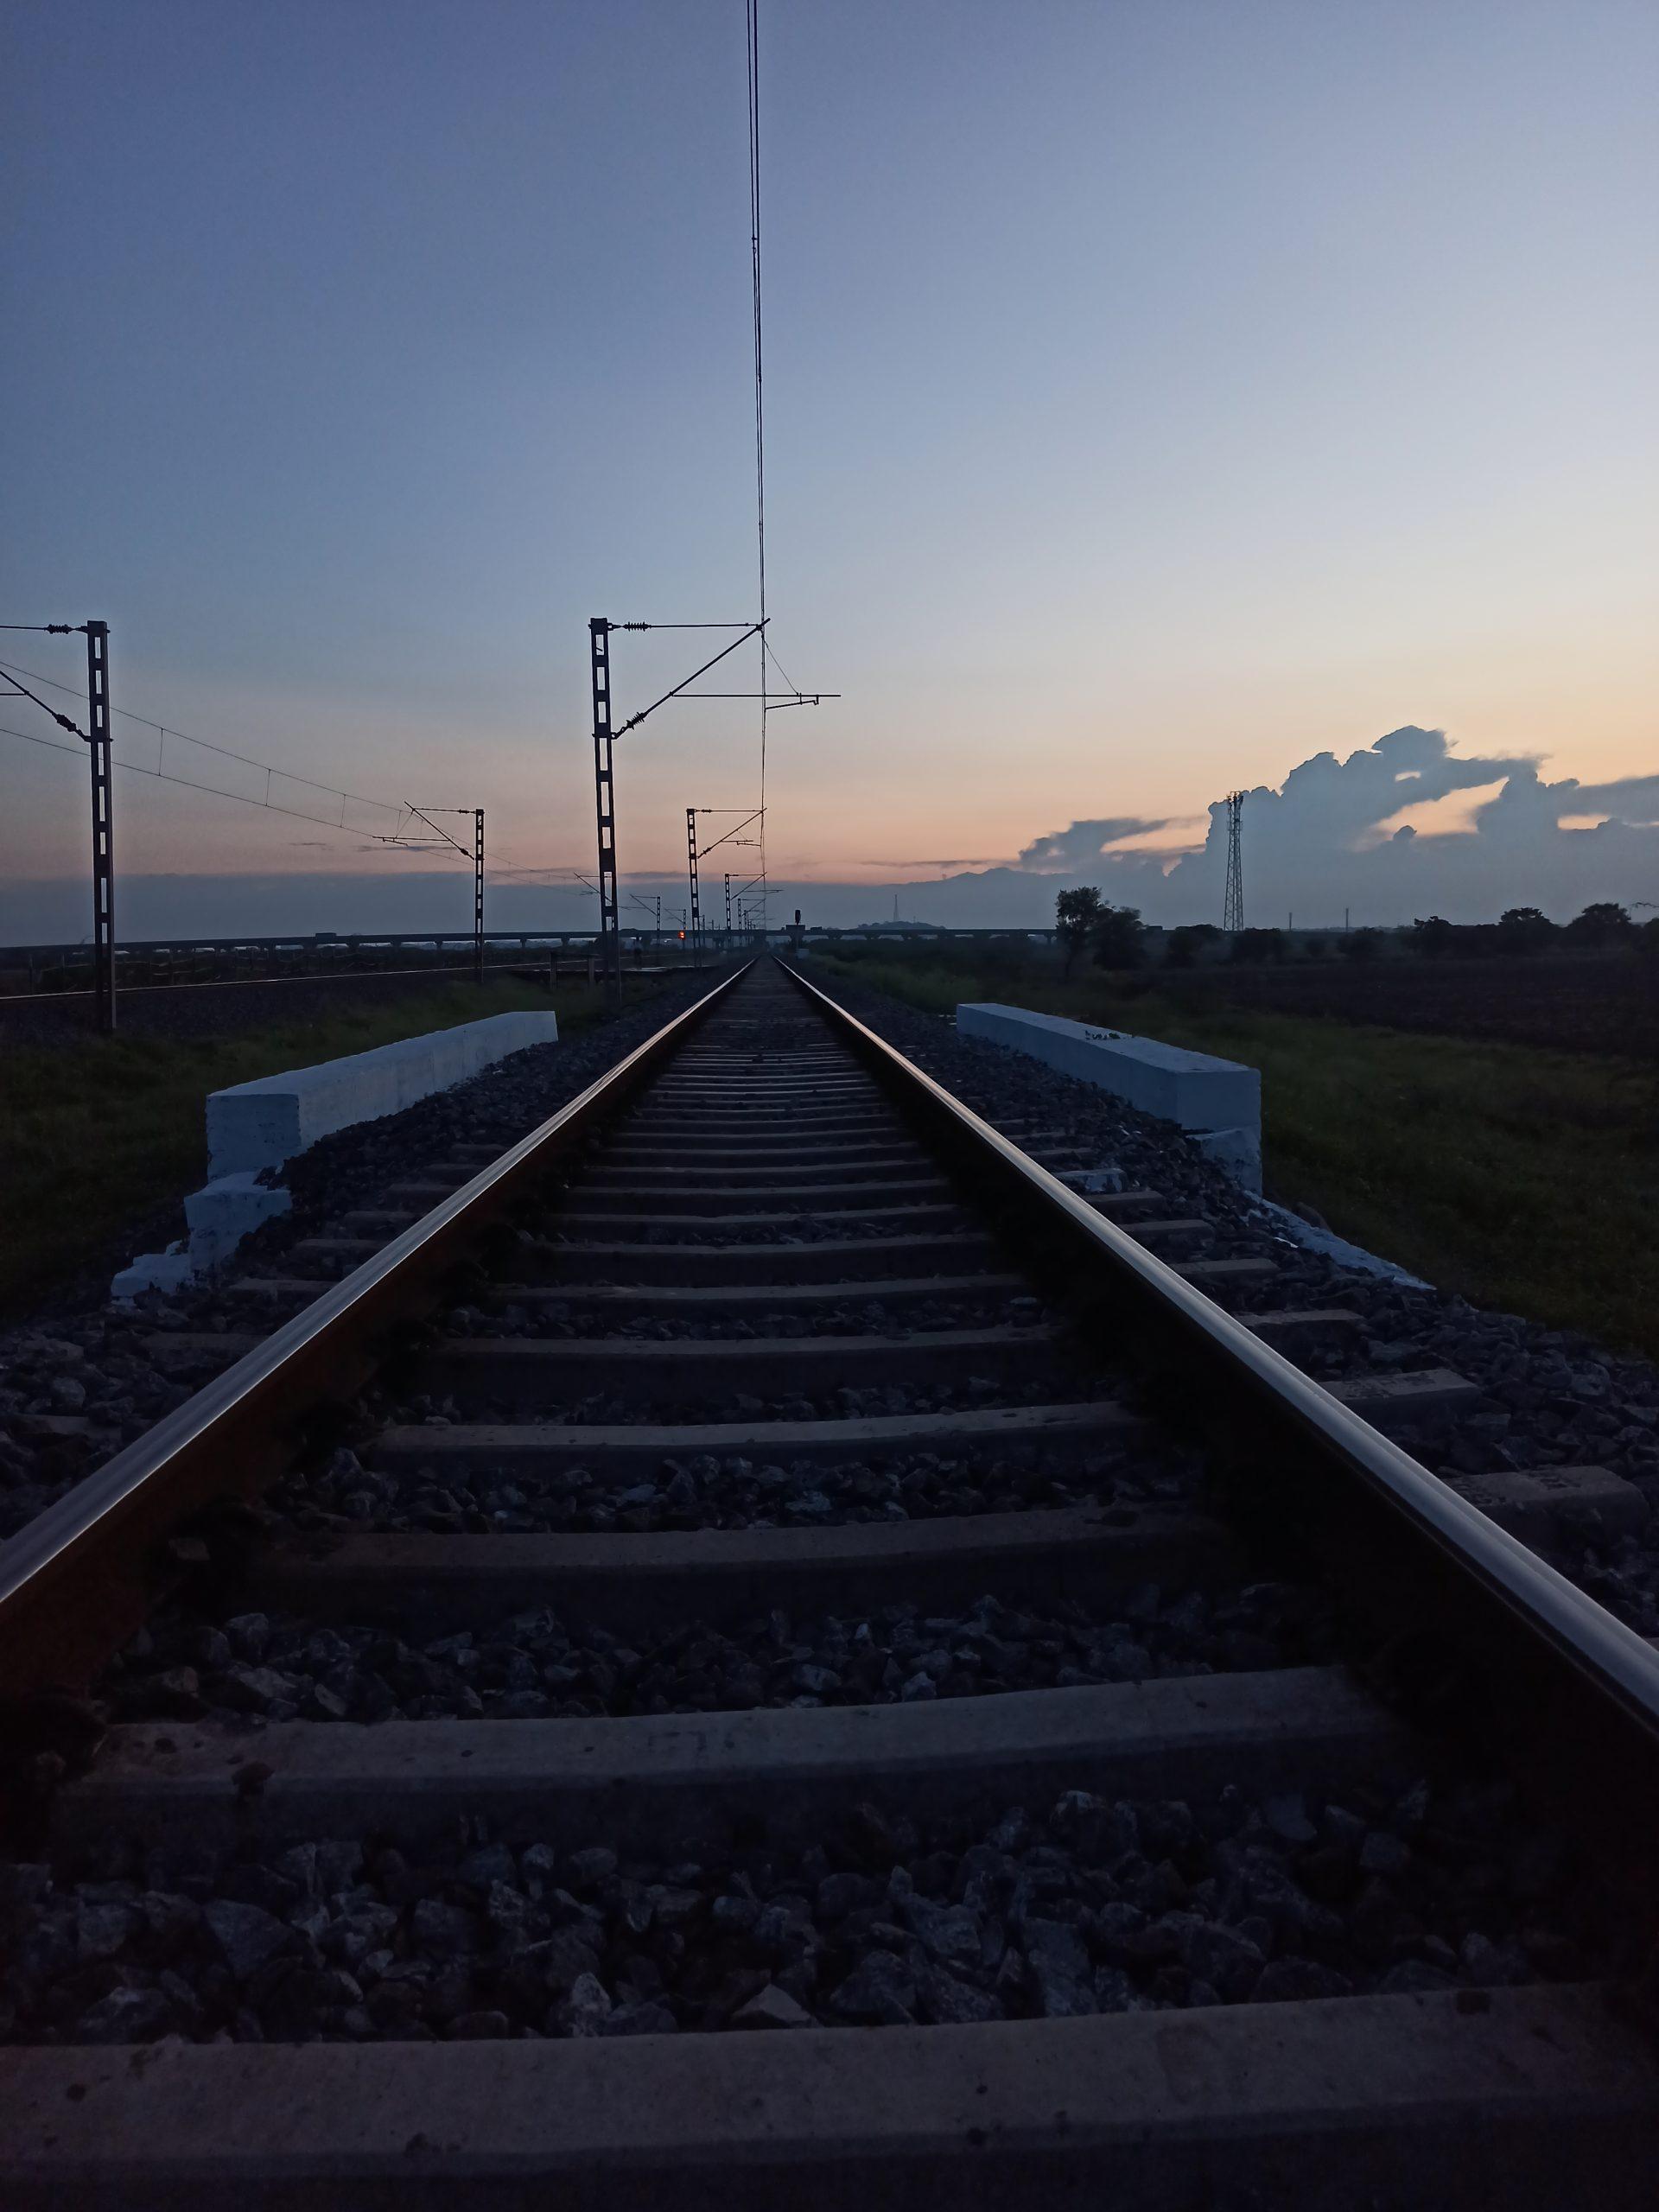 An empty Railway